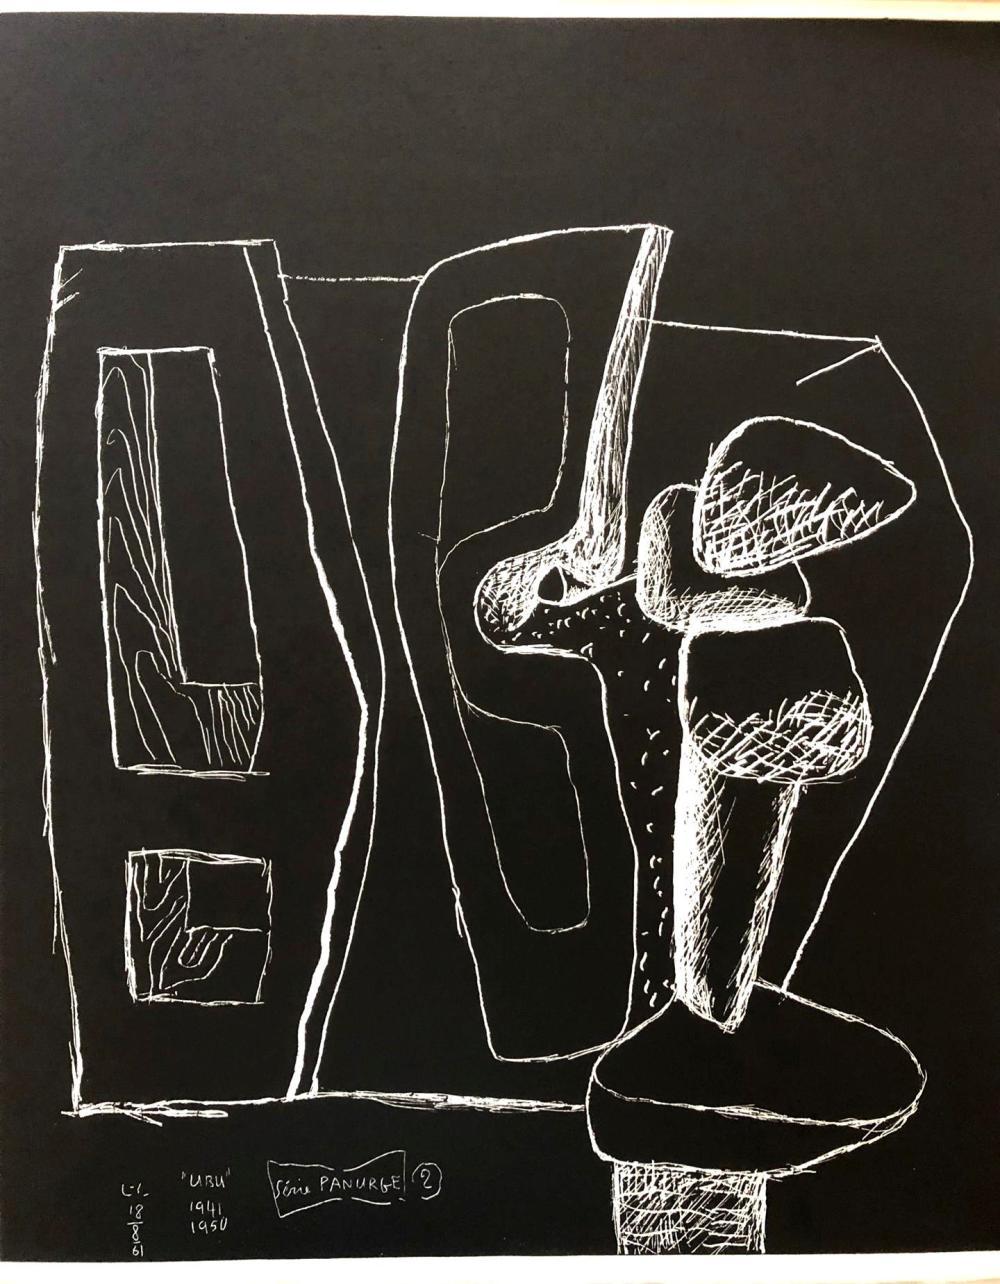 Le Corbusier - Ubu le Panurge, 1962